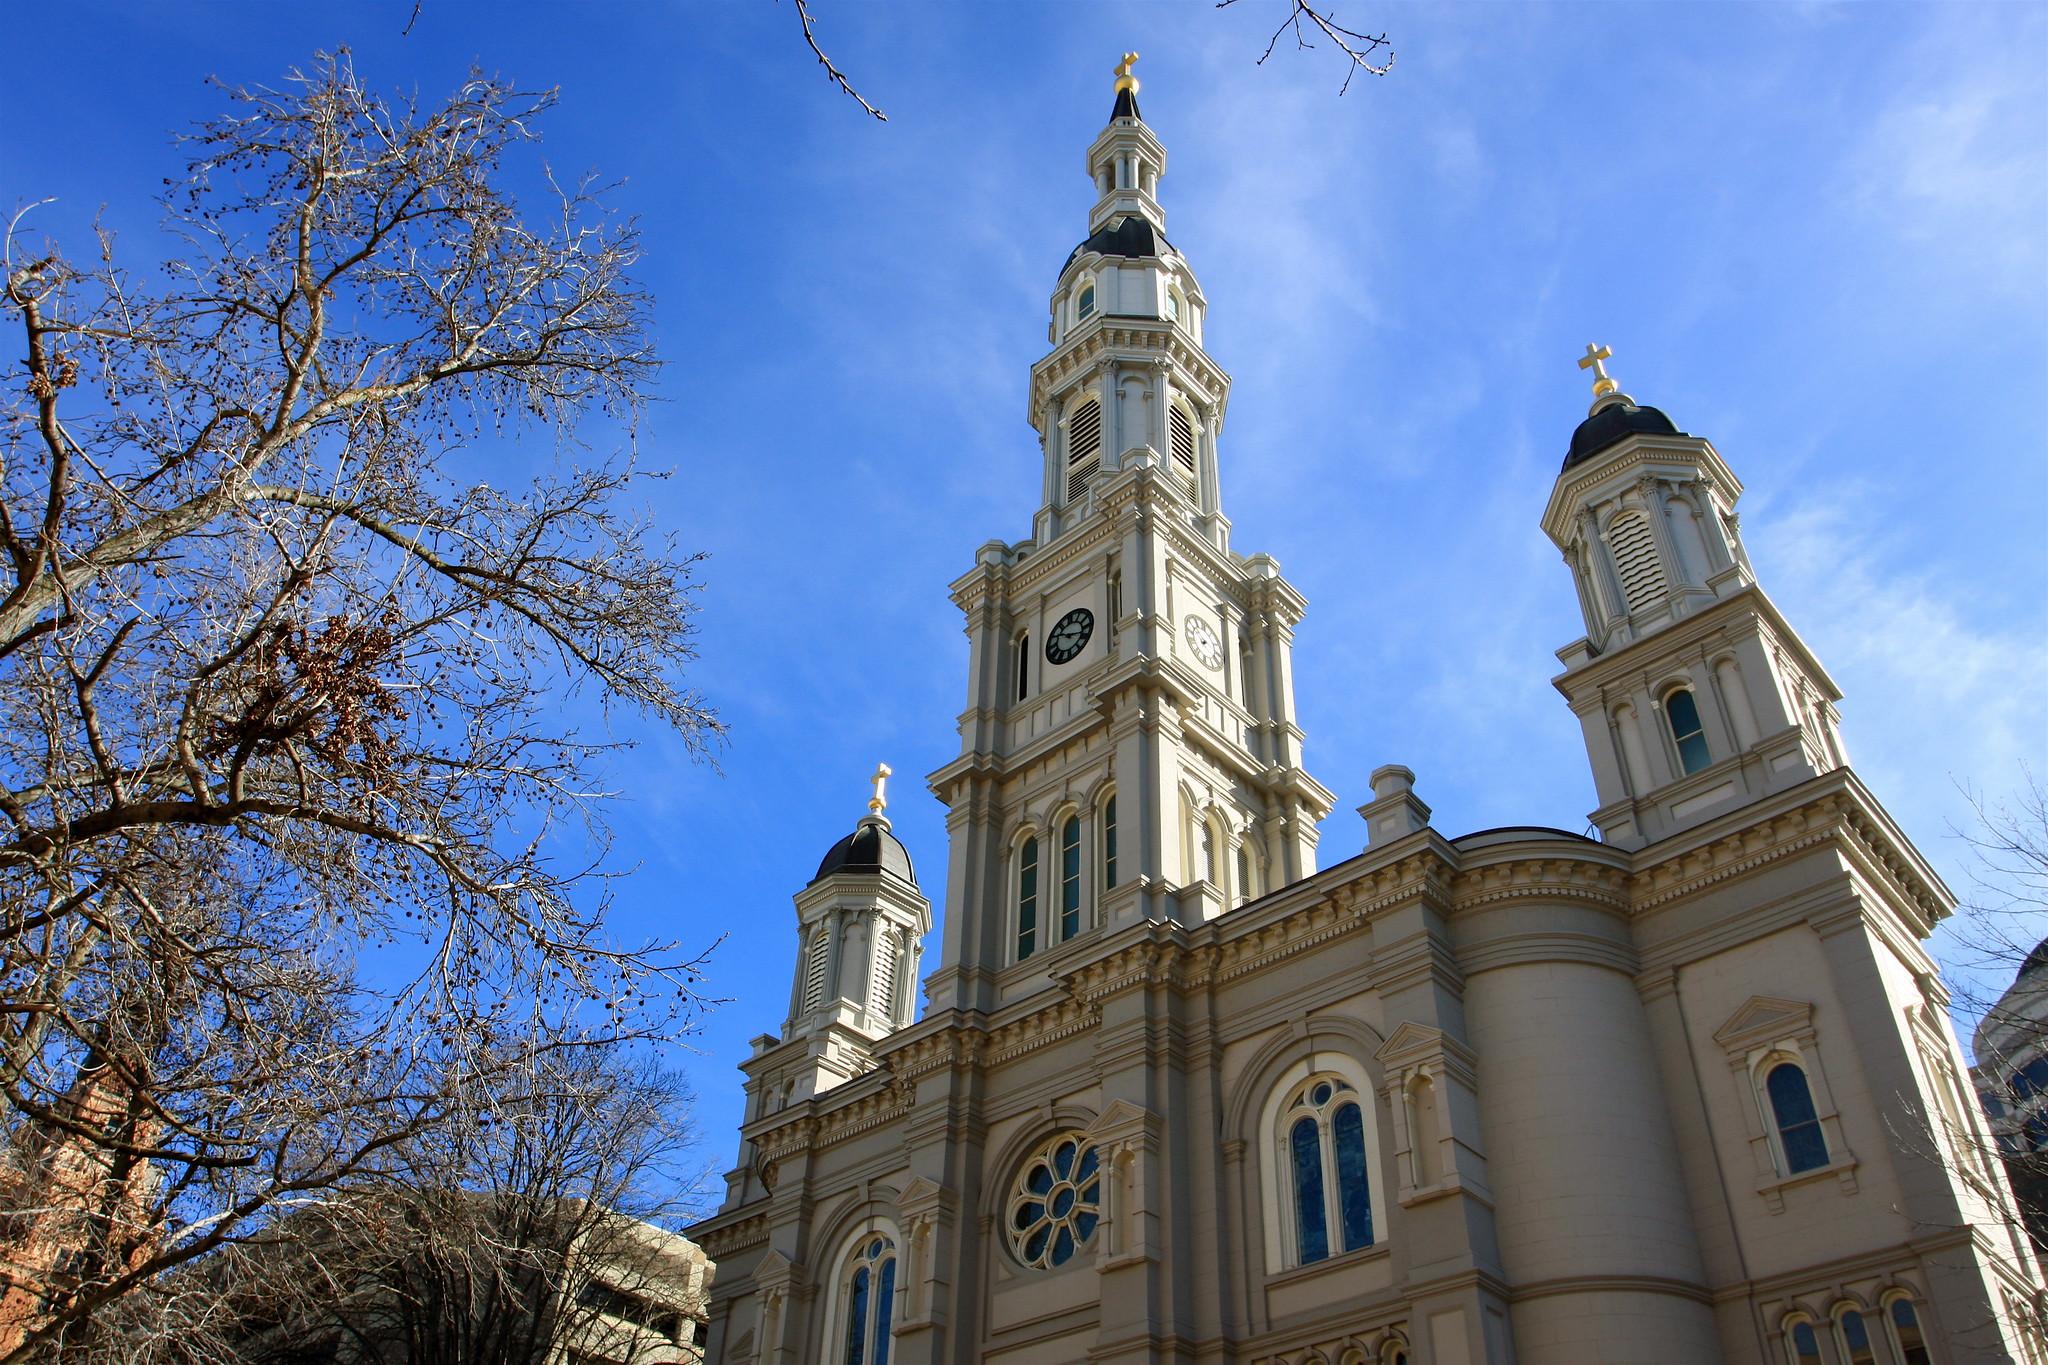 15 Things to do in Sacramento, California